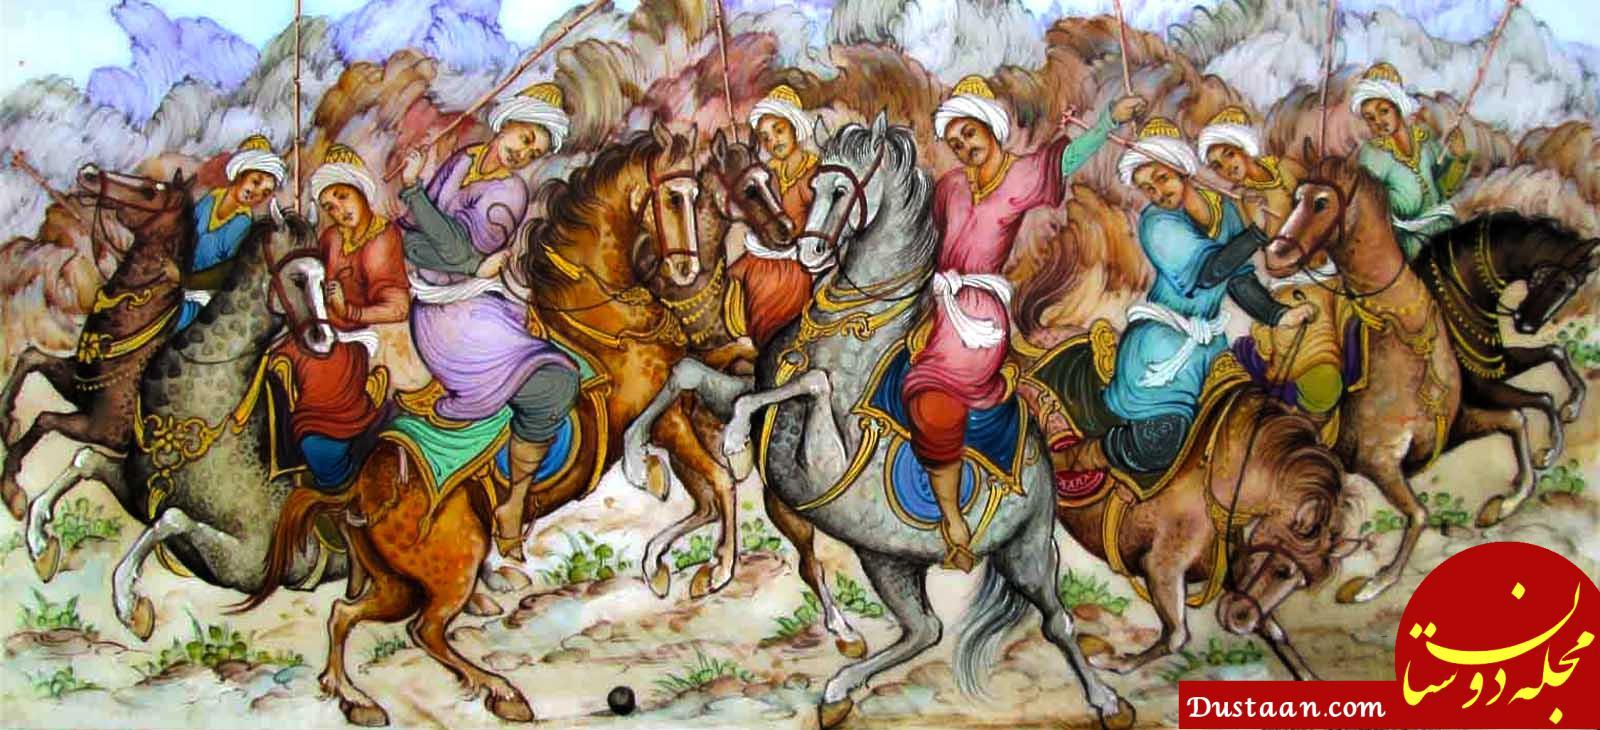 www.dustaan.com سابقه بازی چوگان در شهرهای مختلف ایران